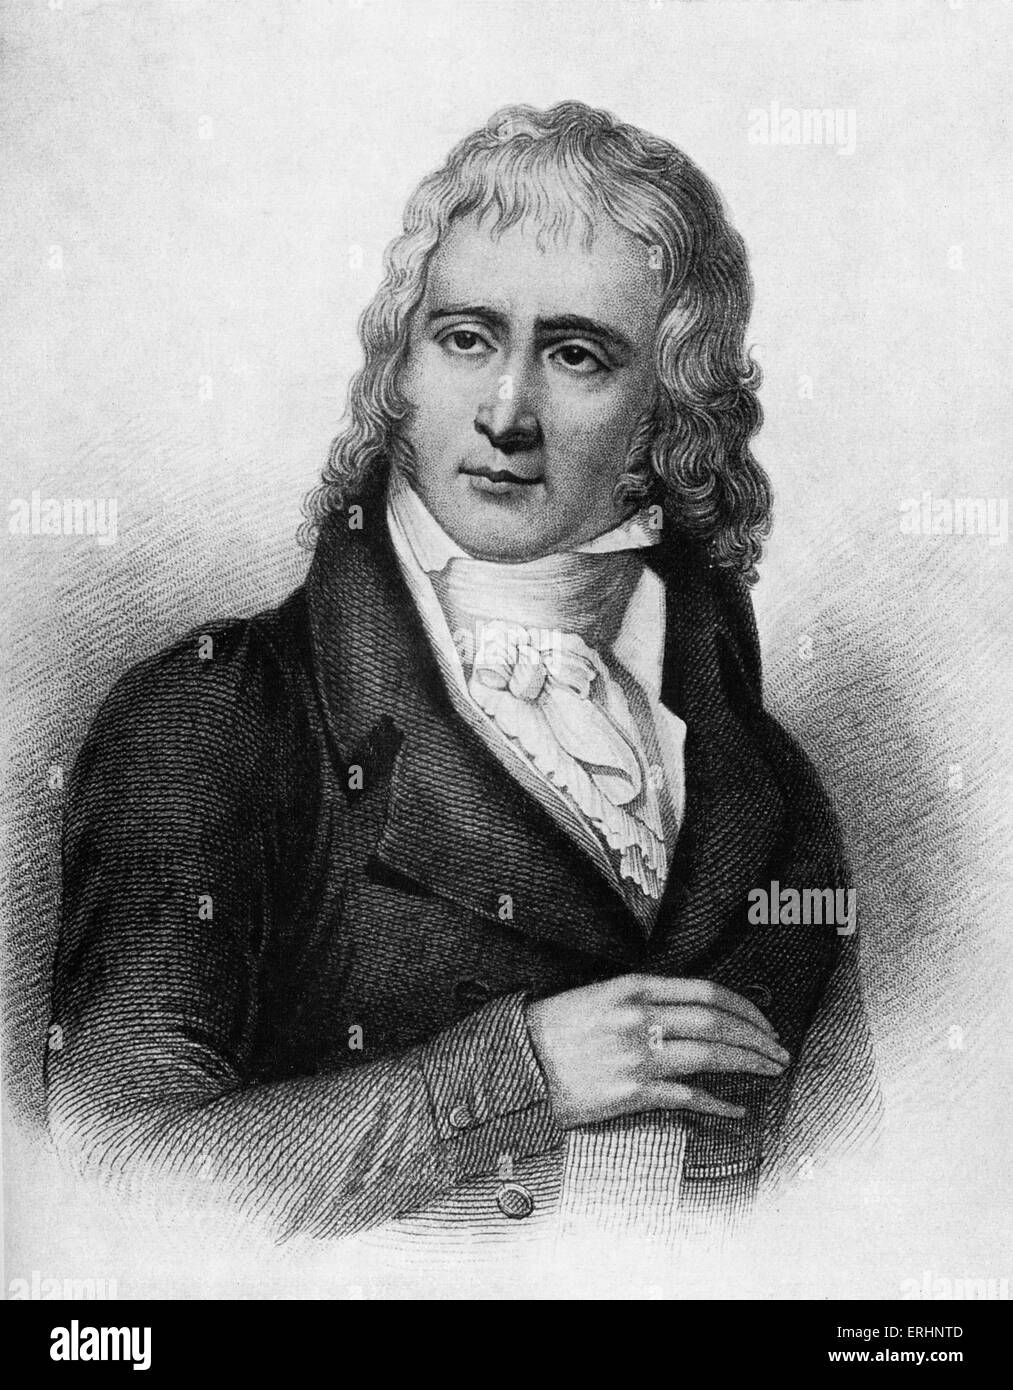 Benjamin Constant in 1800.  Henri-Benjamin Constant de Rebecque, Swiss-born,  writer and French politician.  25 - Stock Image